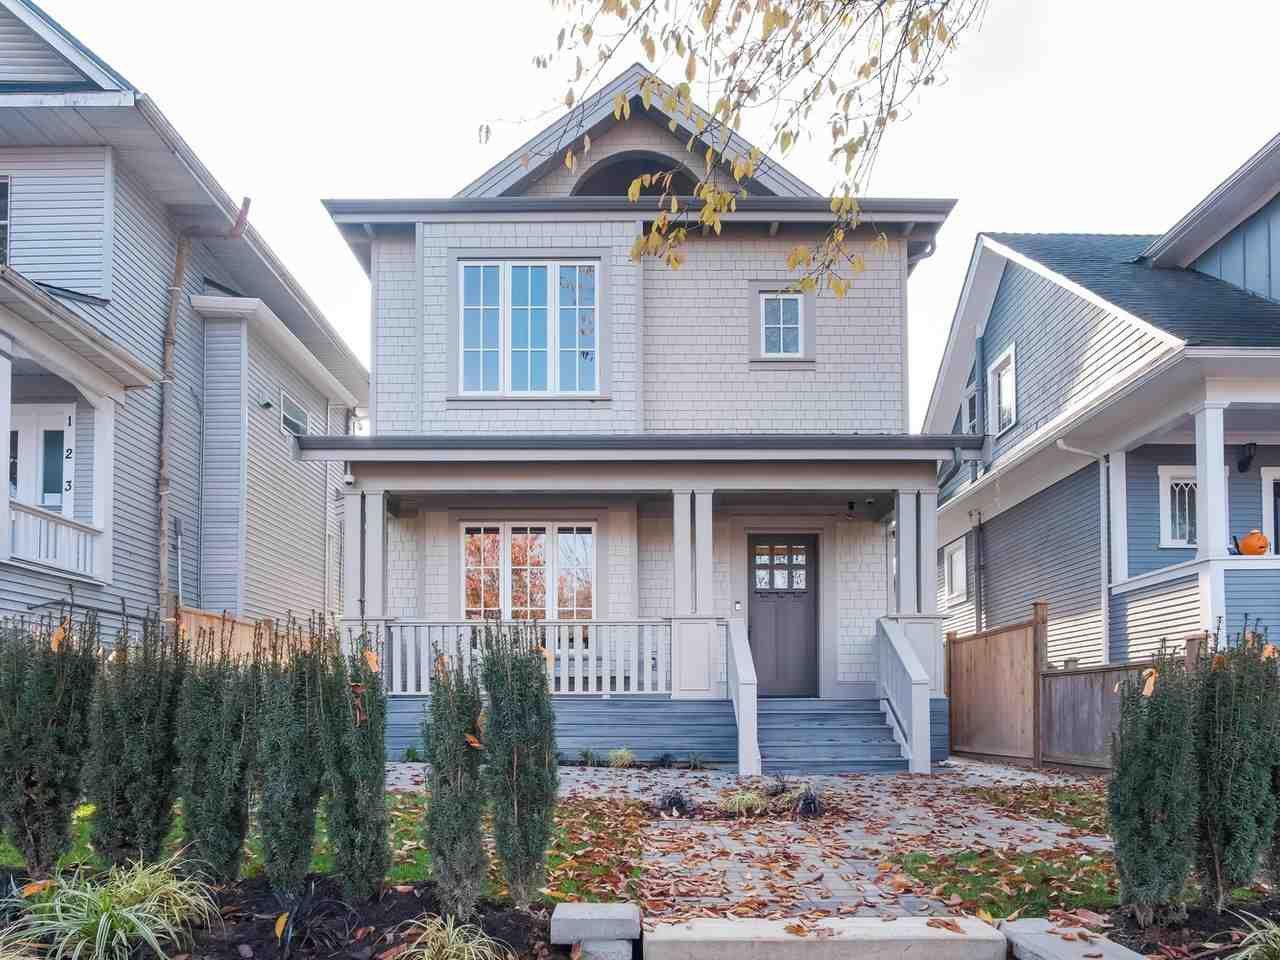 Main Photo: 620 E 11 AVENUE in Vancouver: Mount Pleasant VE 1/2 Duplex for sale (Vancouver East)  : MLS®# R2418353